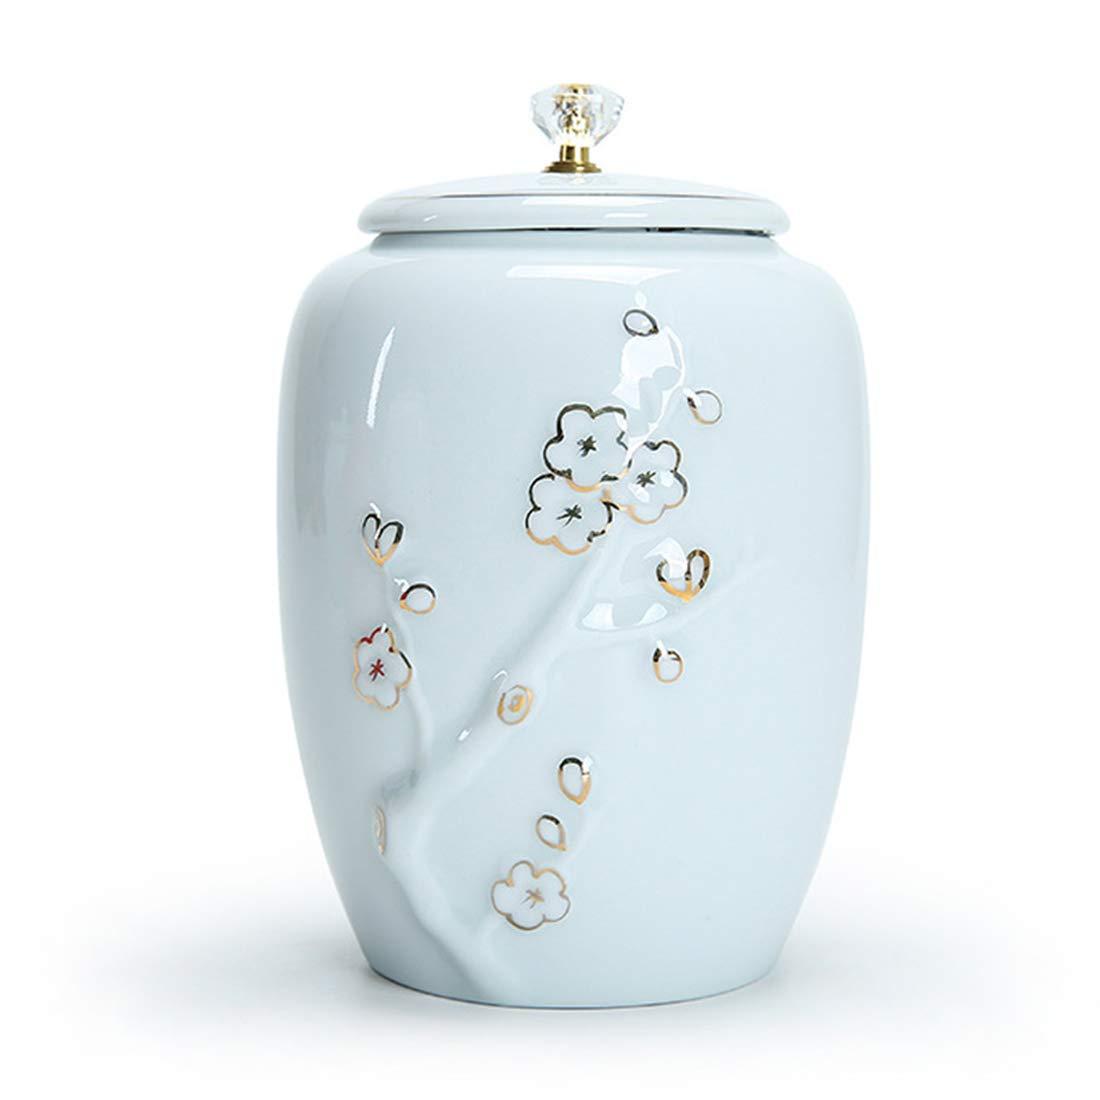 2 Ceramic Pet Casket HandPainted Plum Cremation Urn Crock Celadon